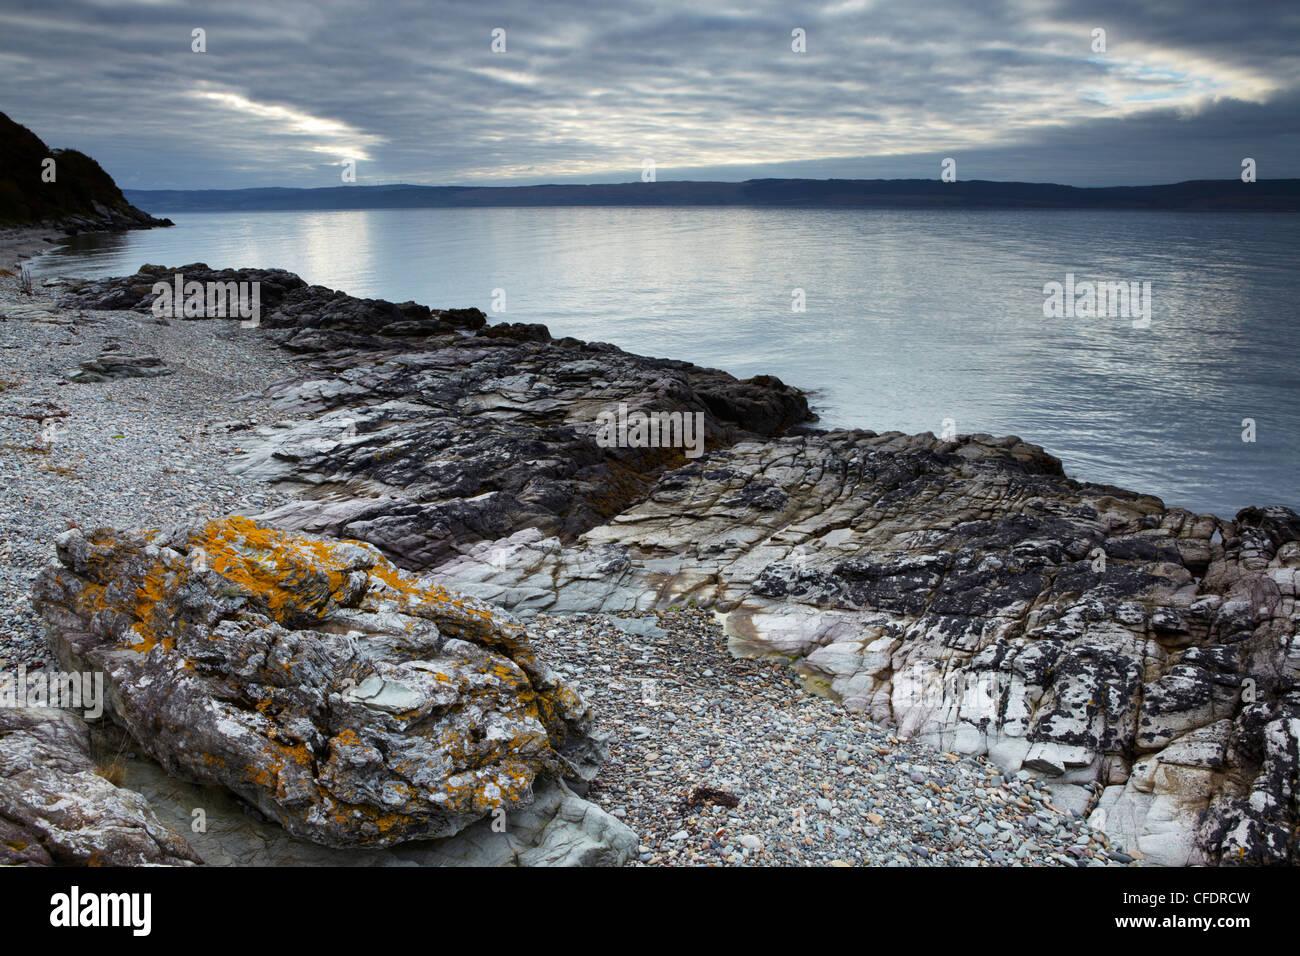 The coast of the Isle of Arran near Catacol looking across towards the Kintyre Peninsula on the Scottish mainland, - Stock Image